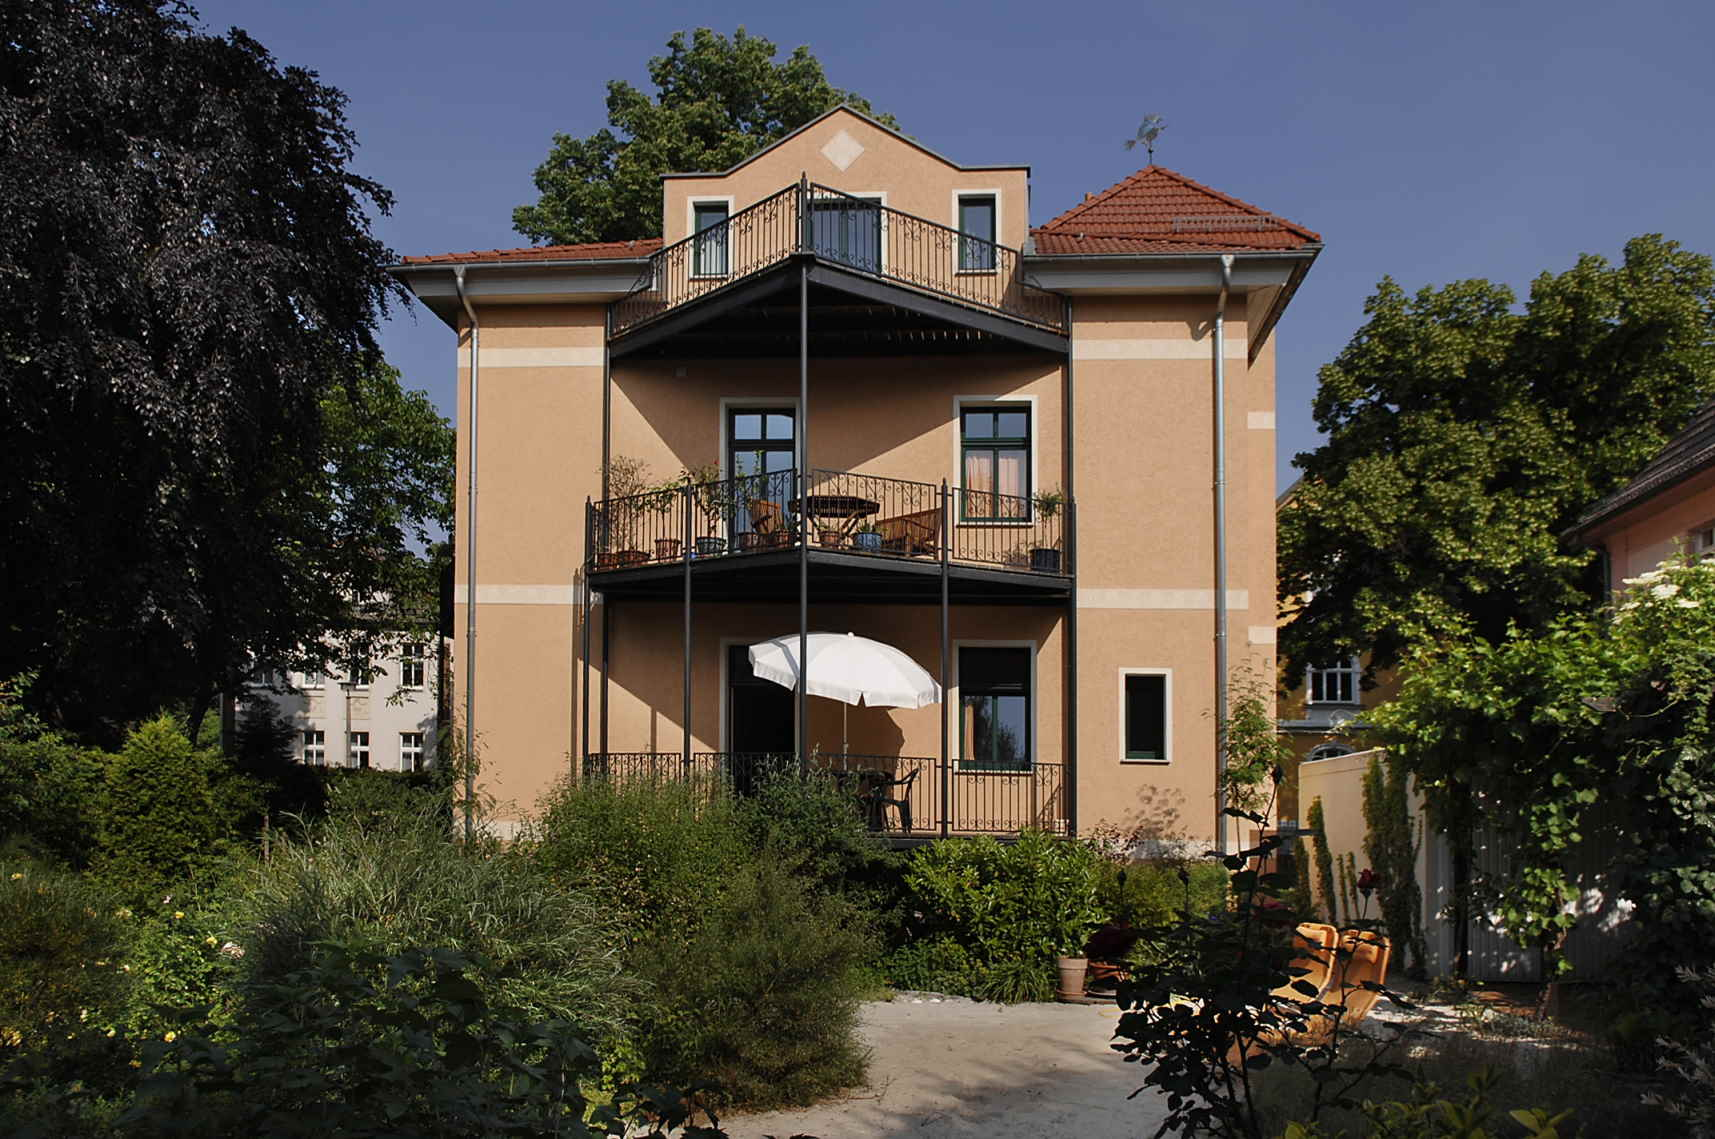 Villa Berlin villa seepark vacation apartment berlin germany eco